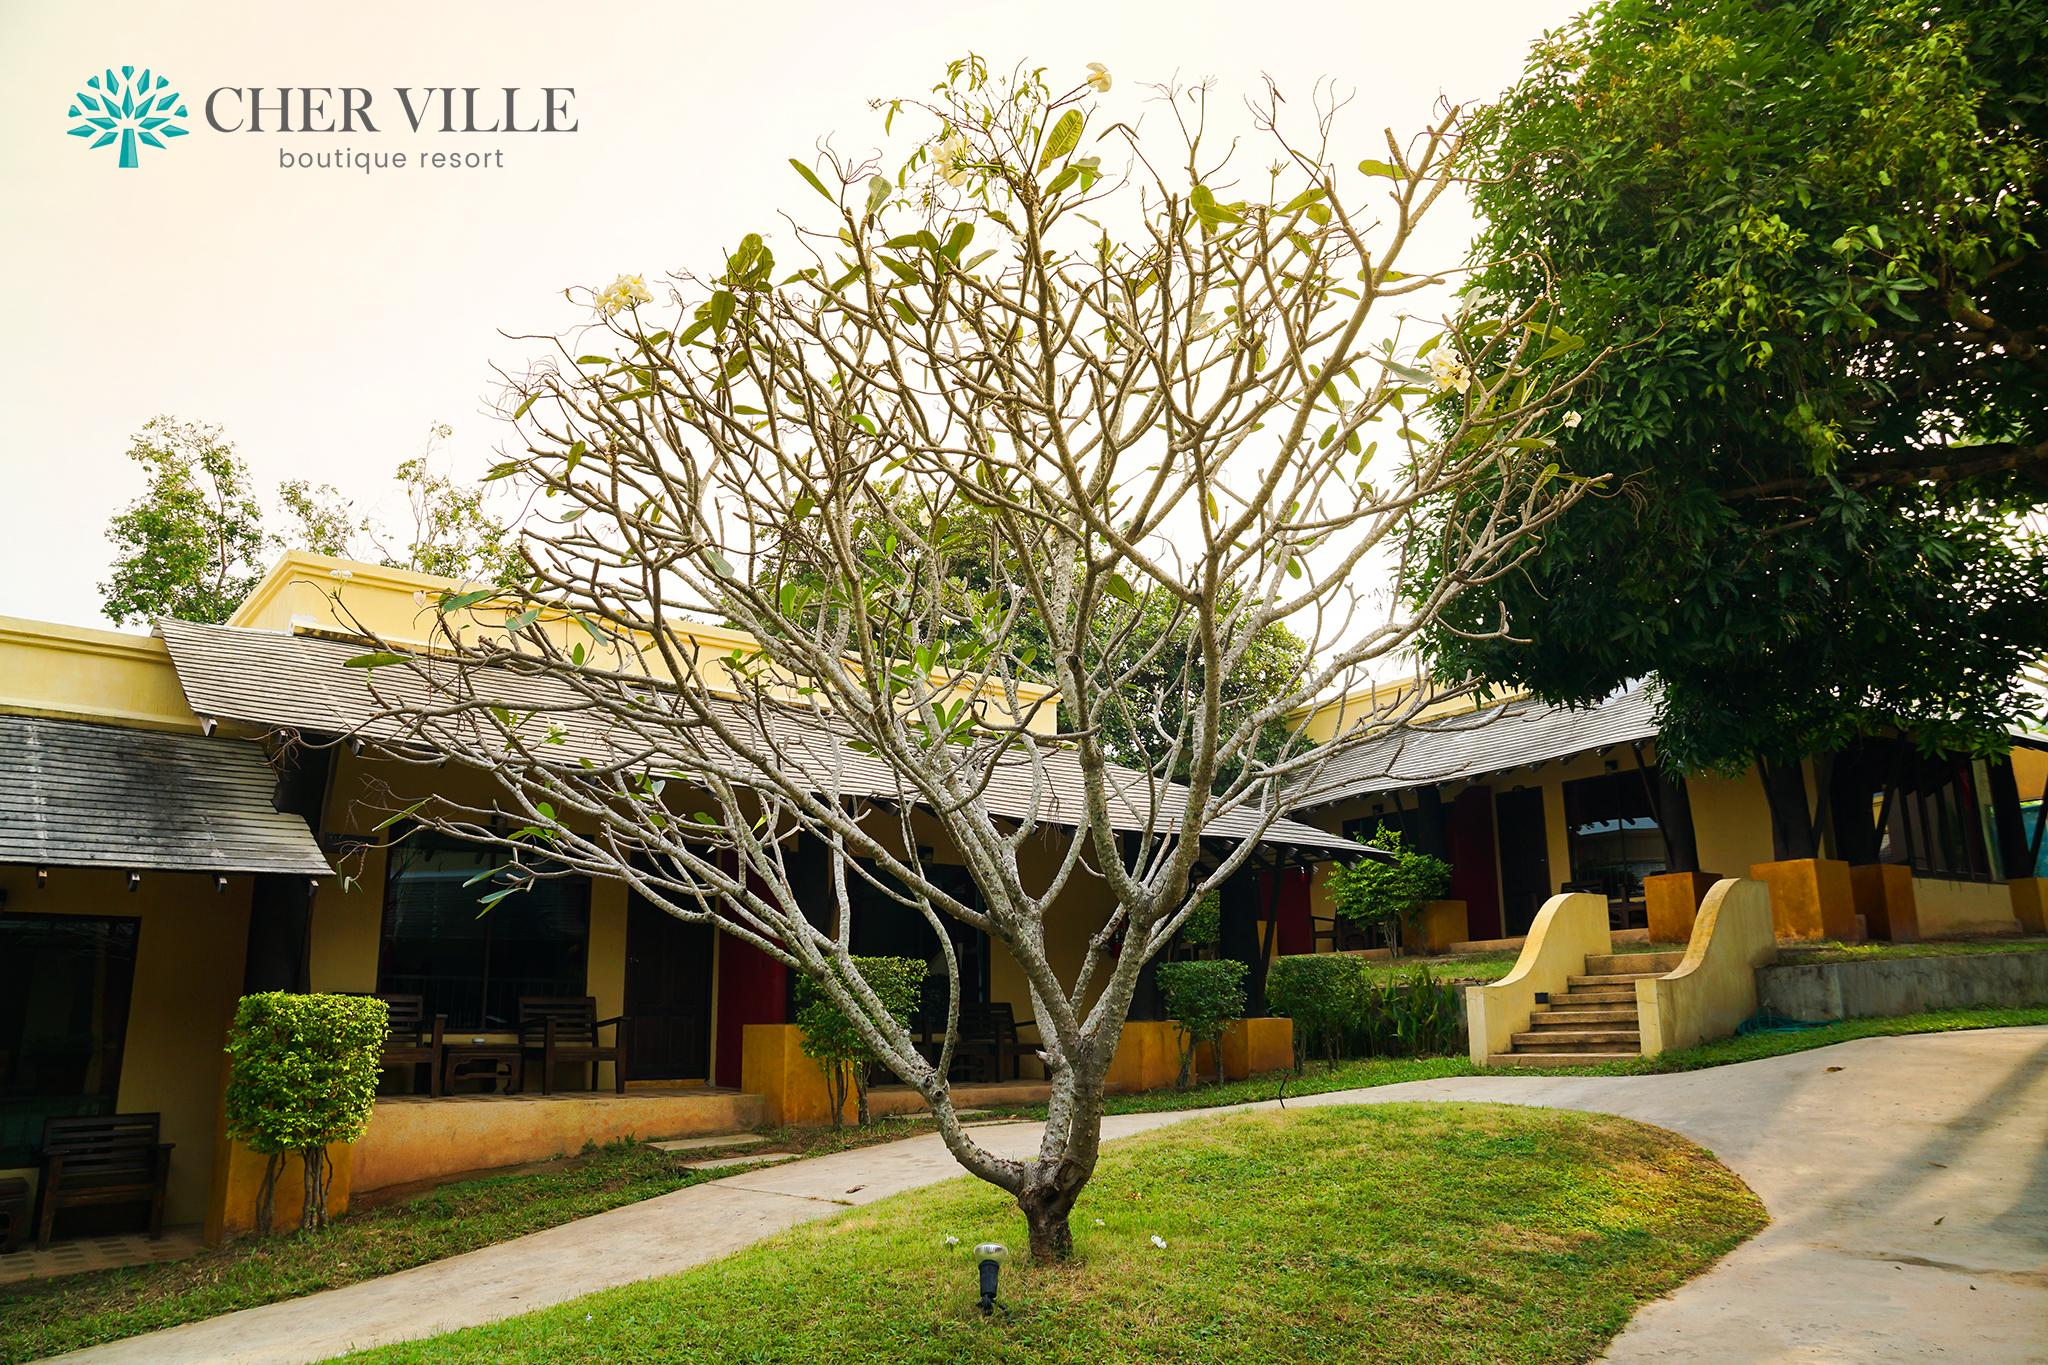 Cher Ville Boutique Resort